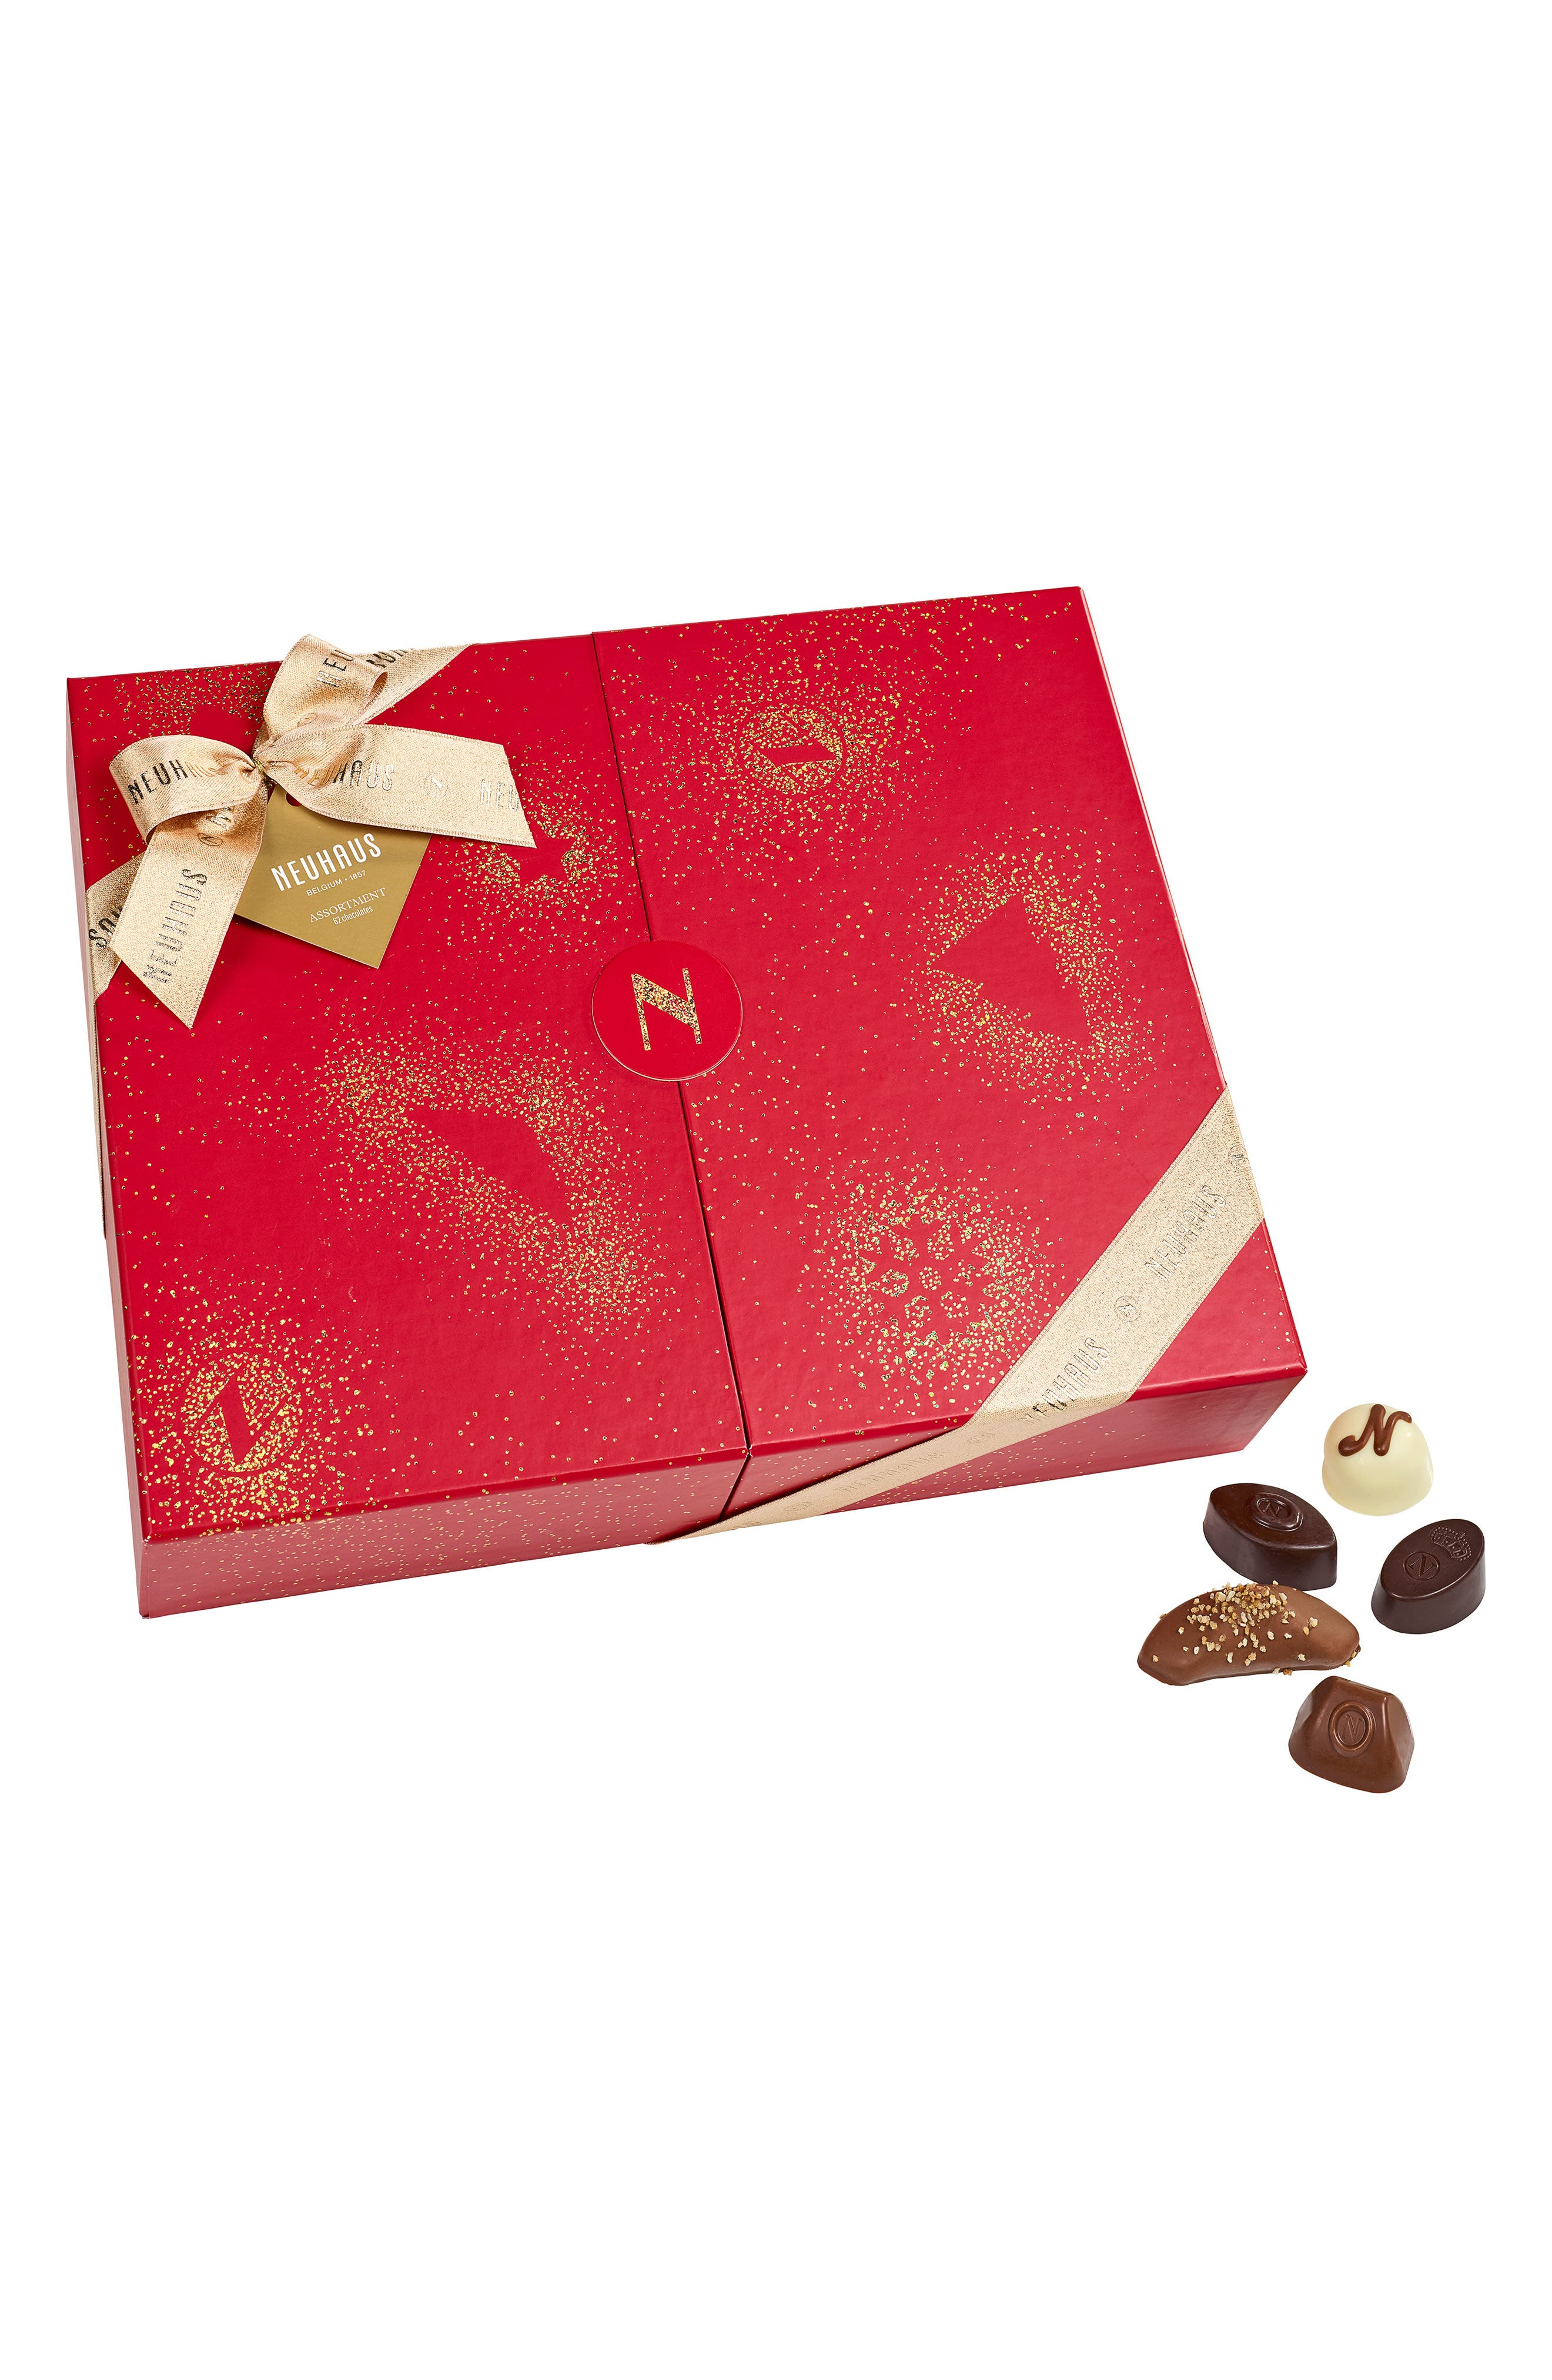 NEUHAUS Premium 62-Piece Chocolate Gift Box, Main, color, 600